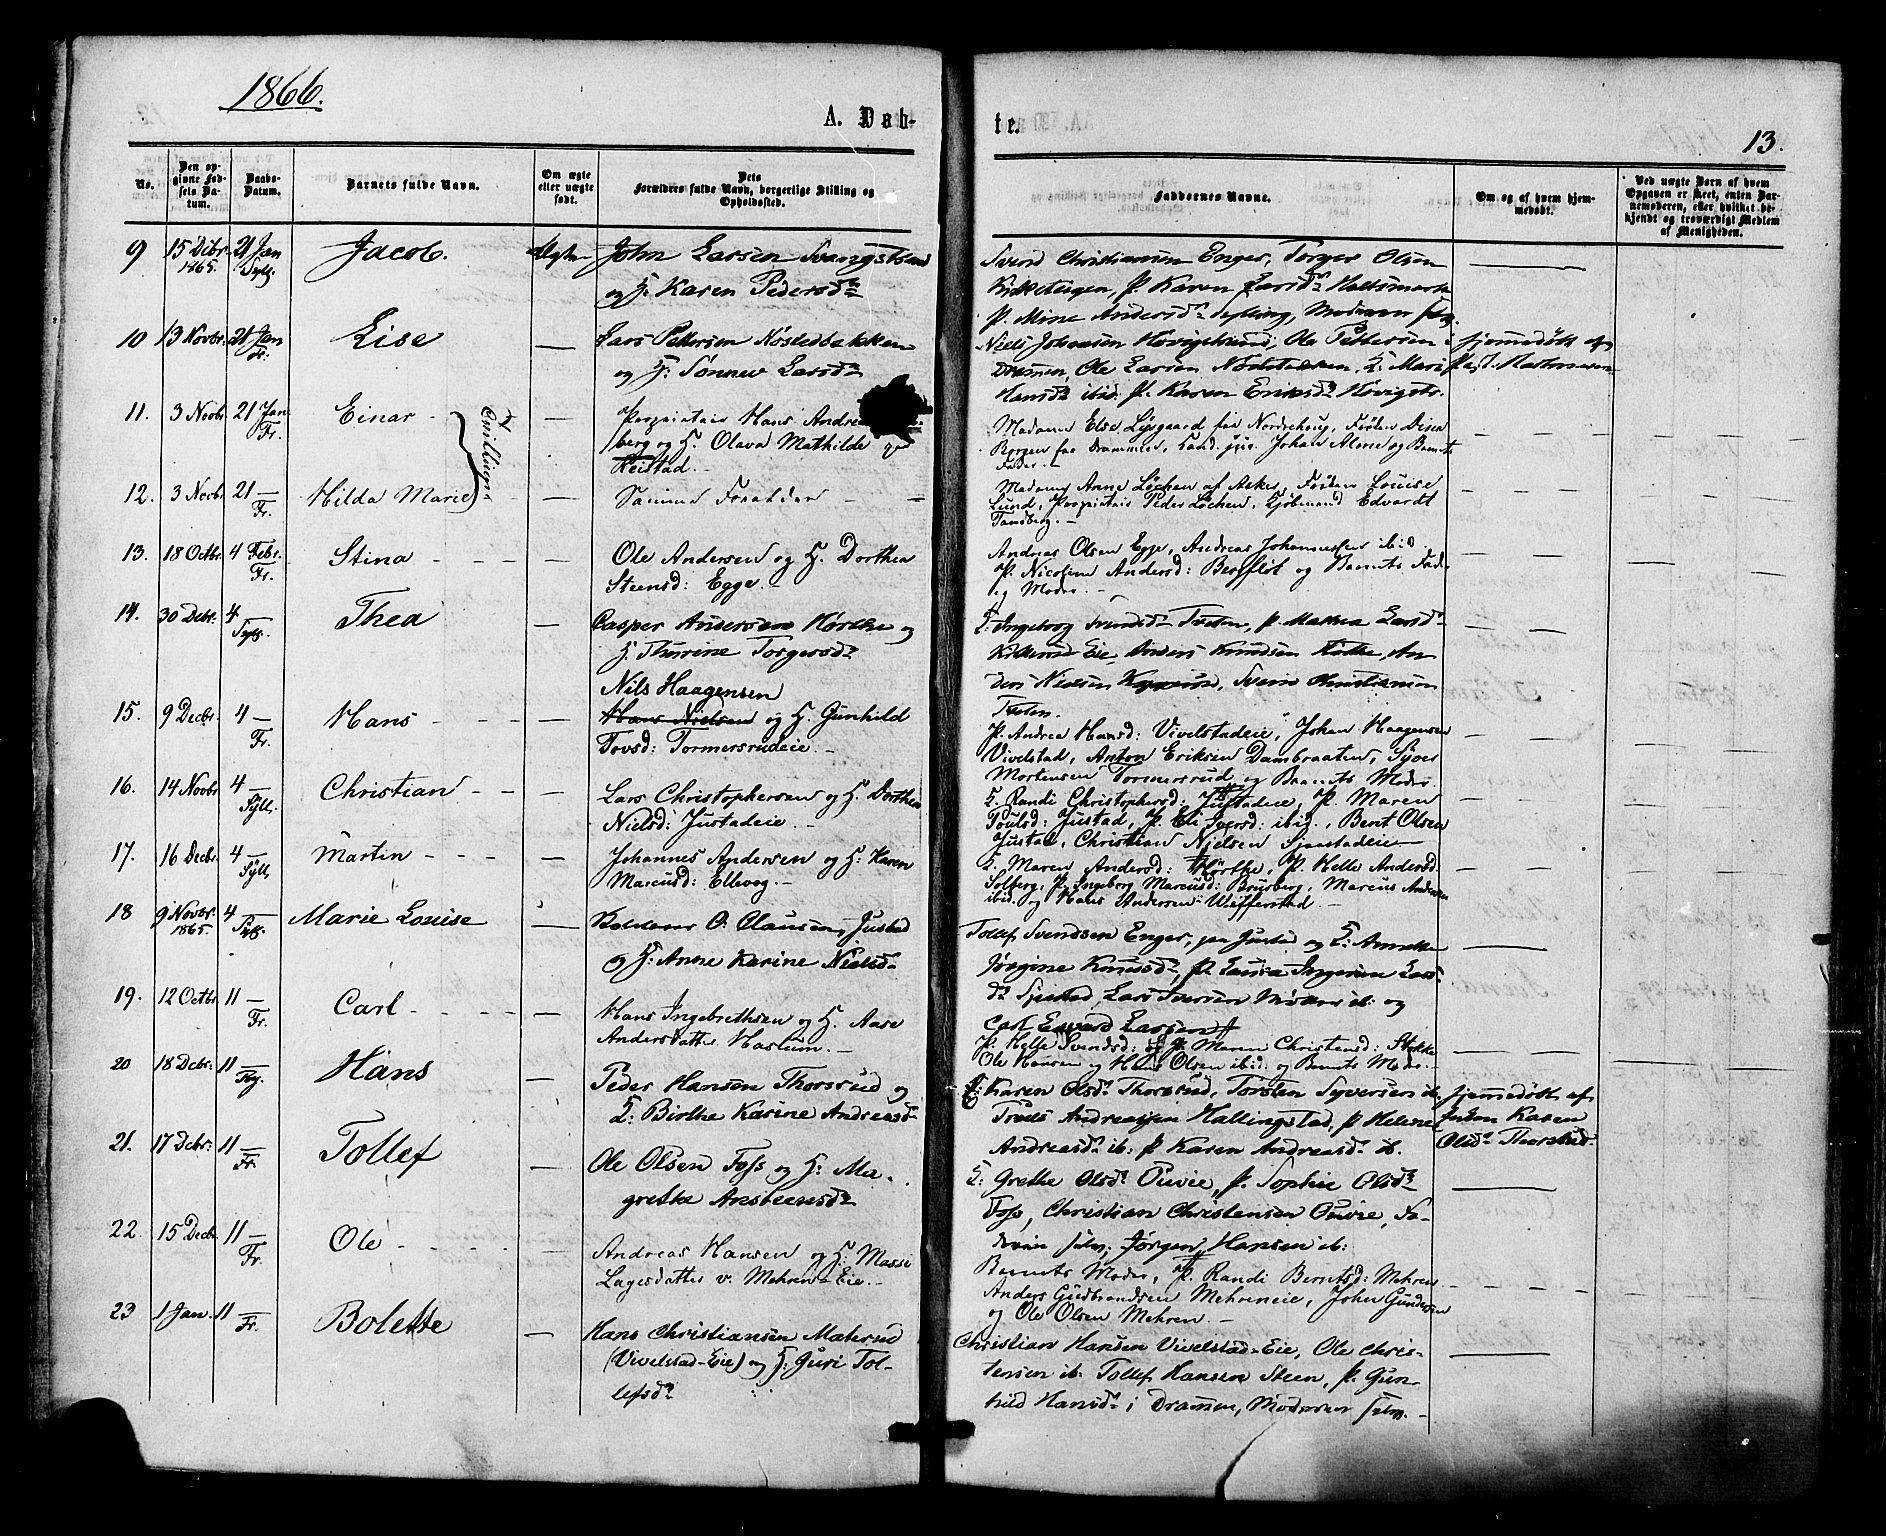 SAKO, Lier kirkebøker, F/Fa/L0013: Ministerialbok nr. I 13, 1865-1874, s. 13